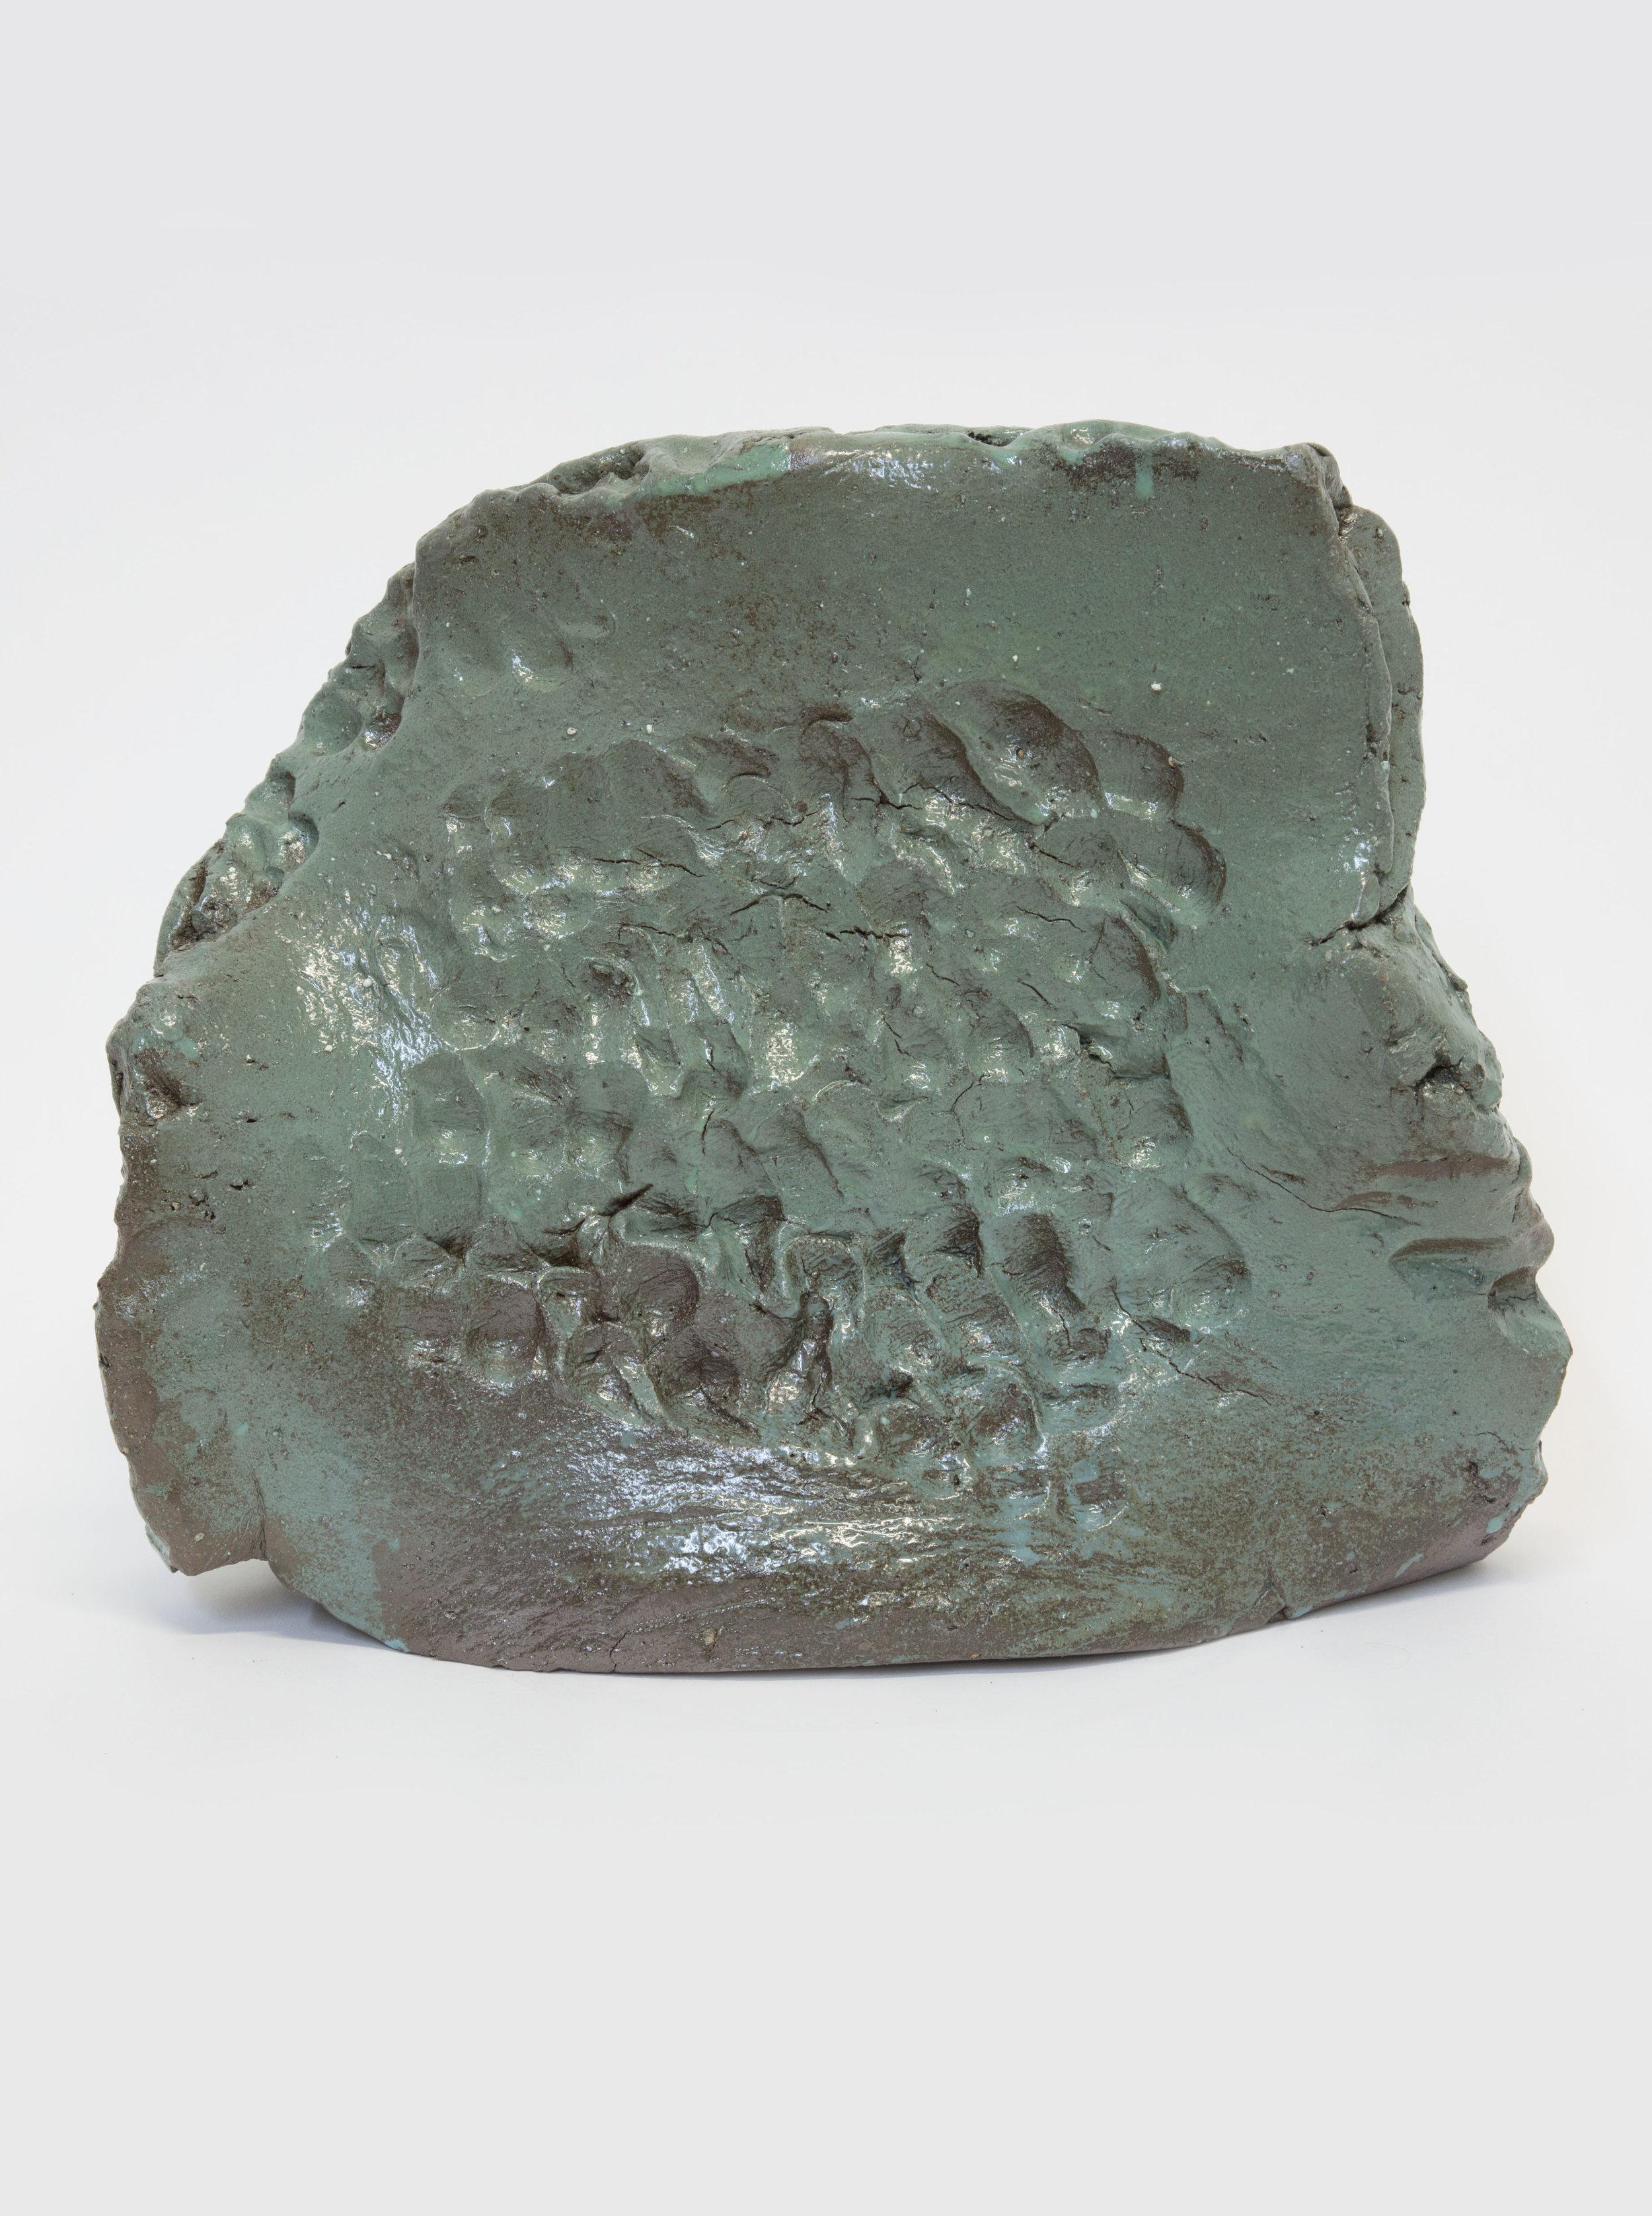 Sebastian Gladstone   Untitled Fired Stoneware , 2018 fired stoneware, glaze 12 x 17 x 5 in.